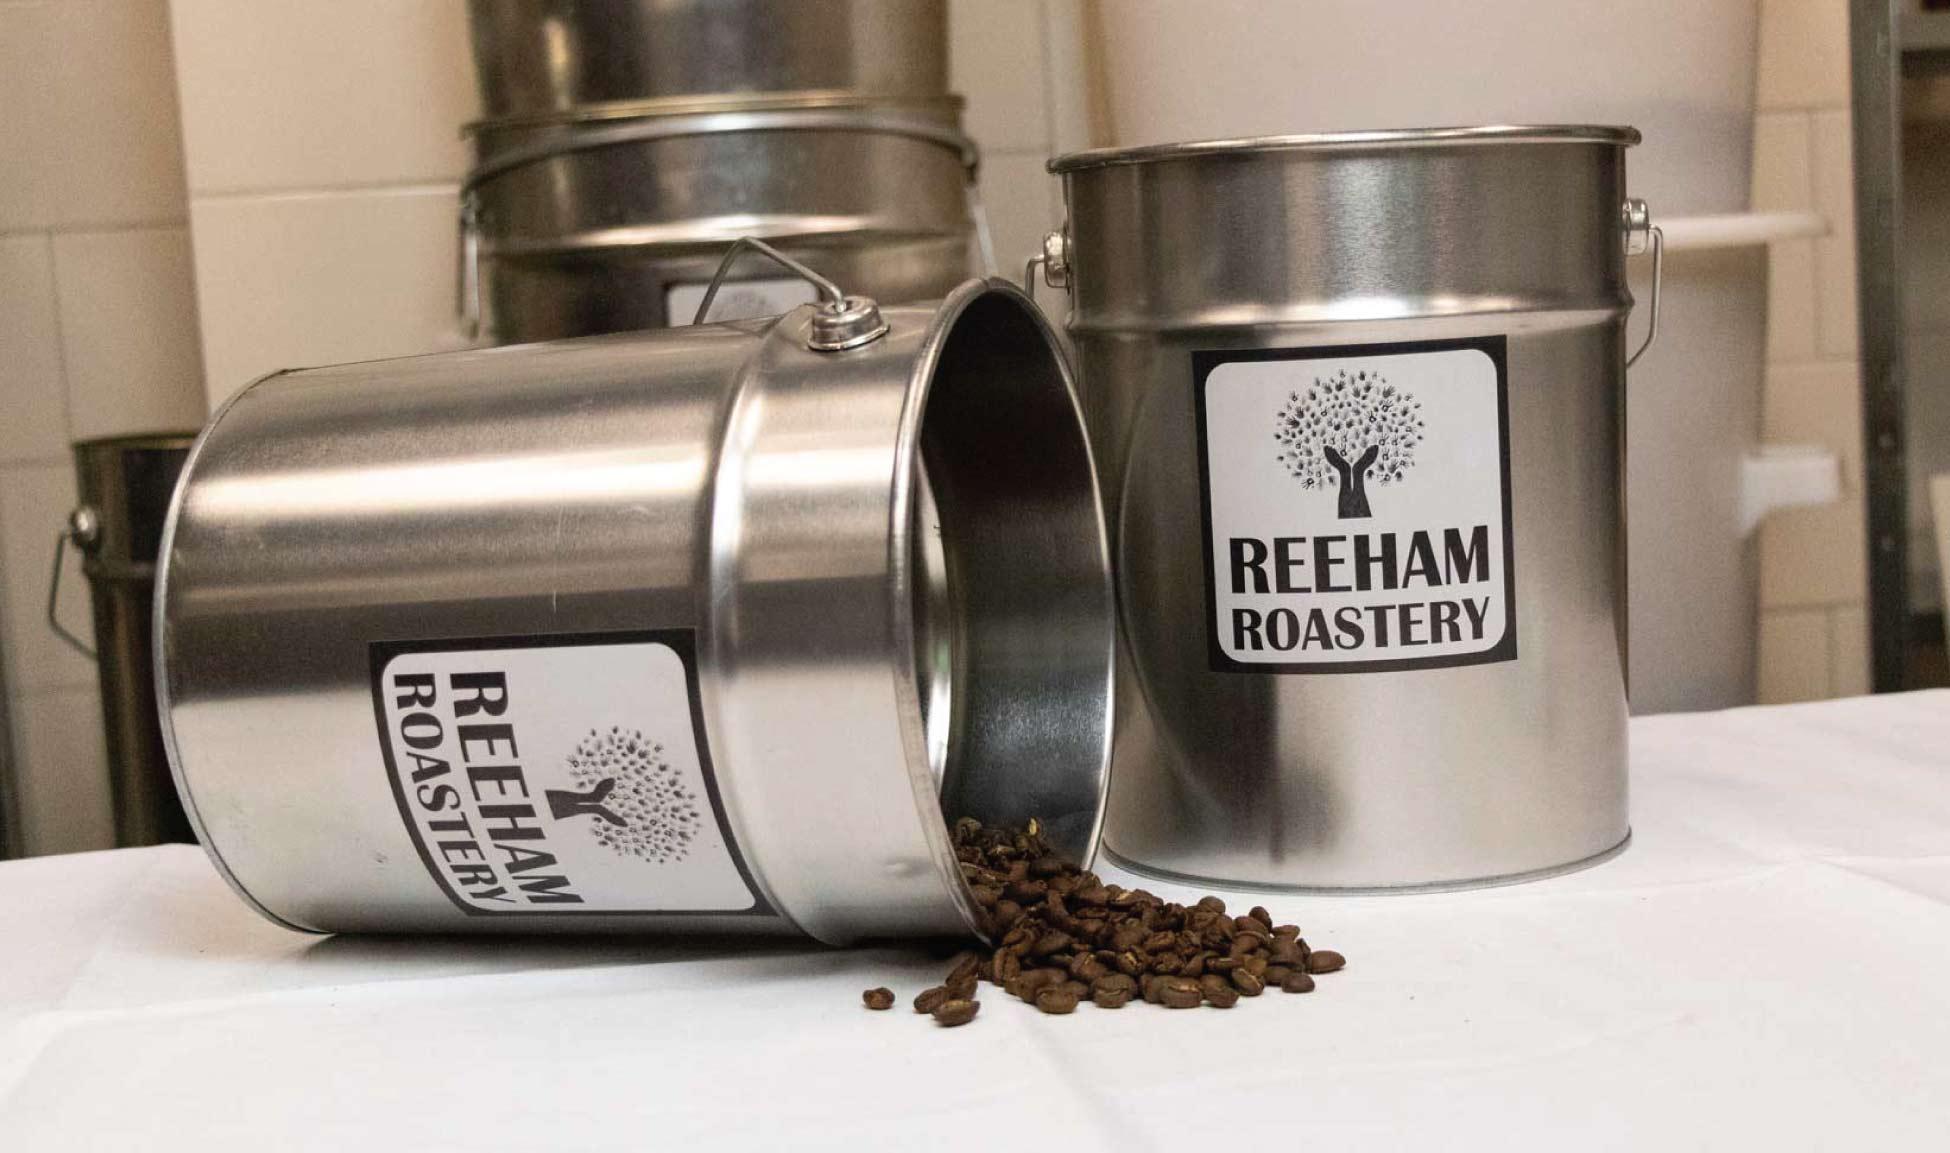 Kaffee als starke Marke